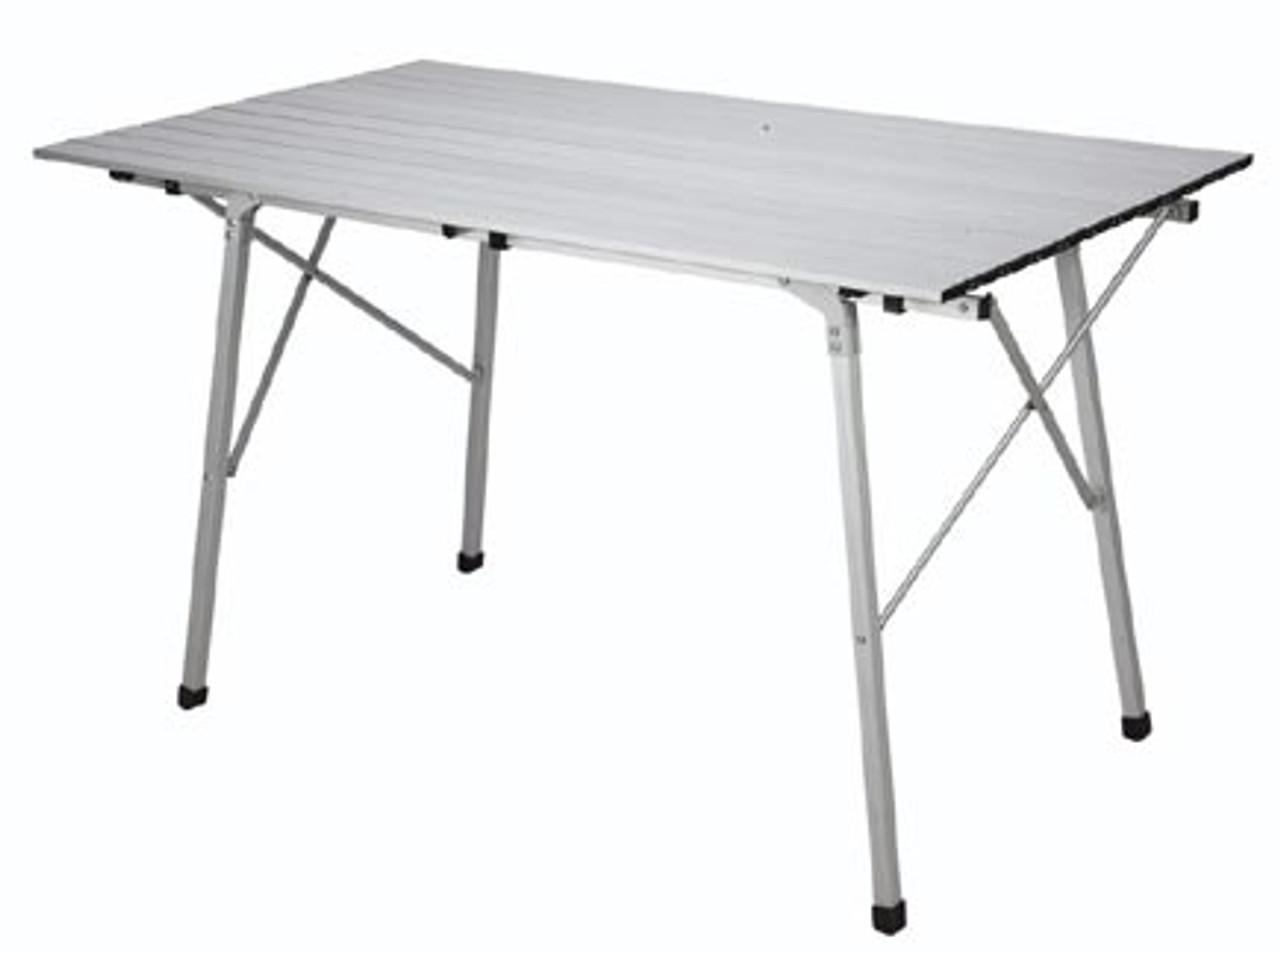 Campro Folding Table 120cm x 70cm